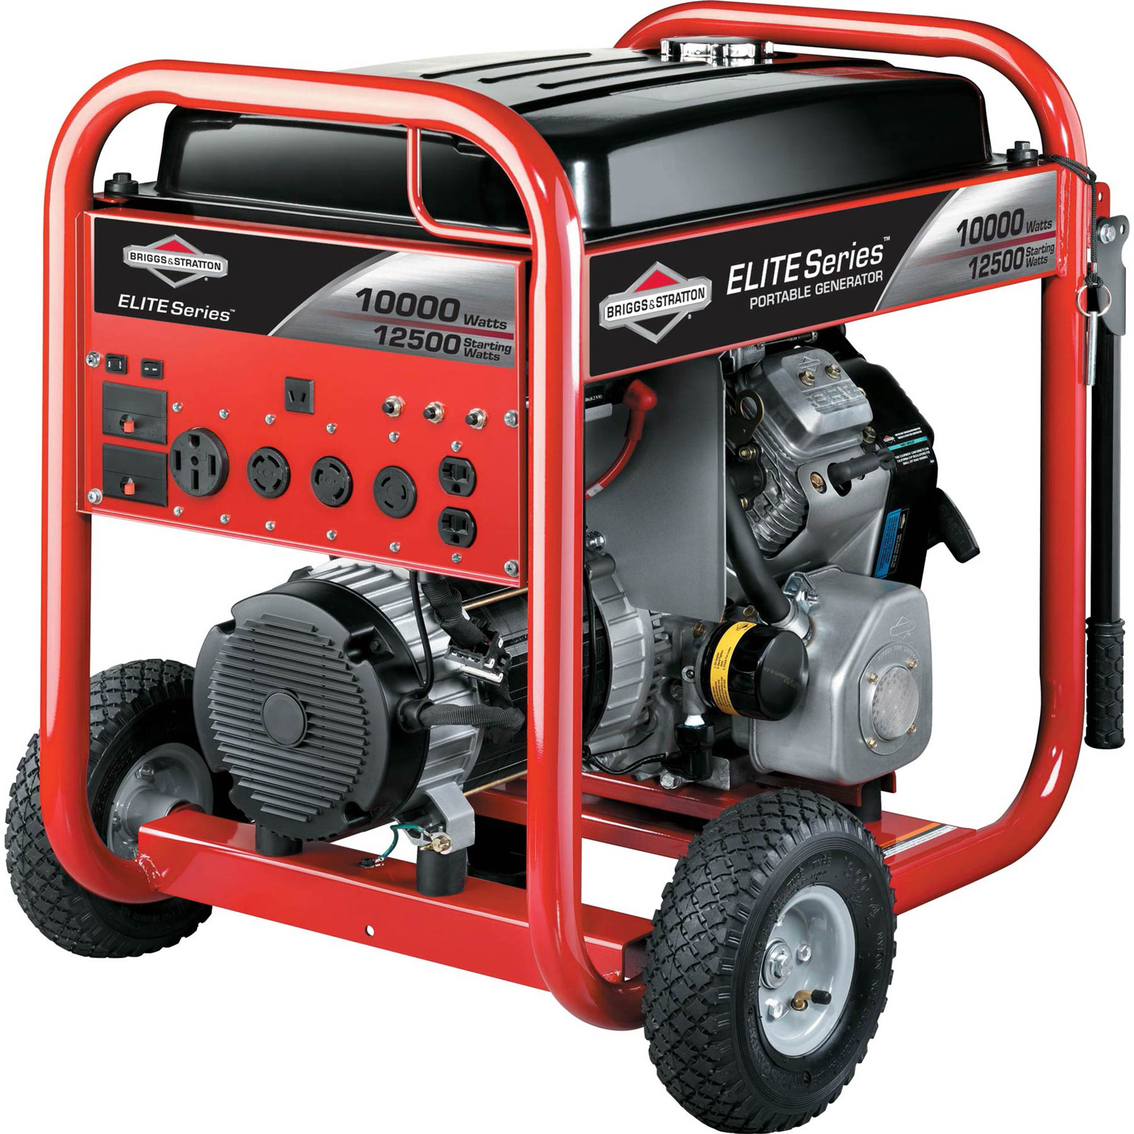 Briggs & Stratton 10,000 Watt Portable Generator | Generators | More